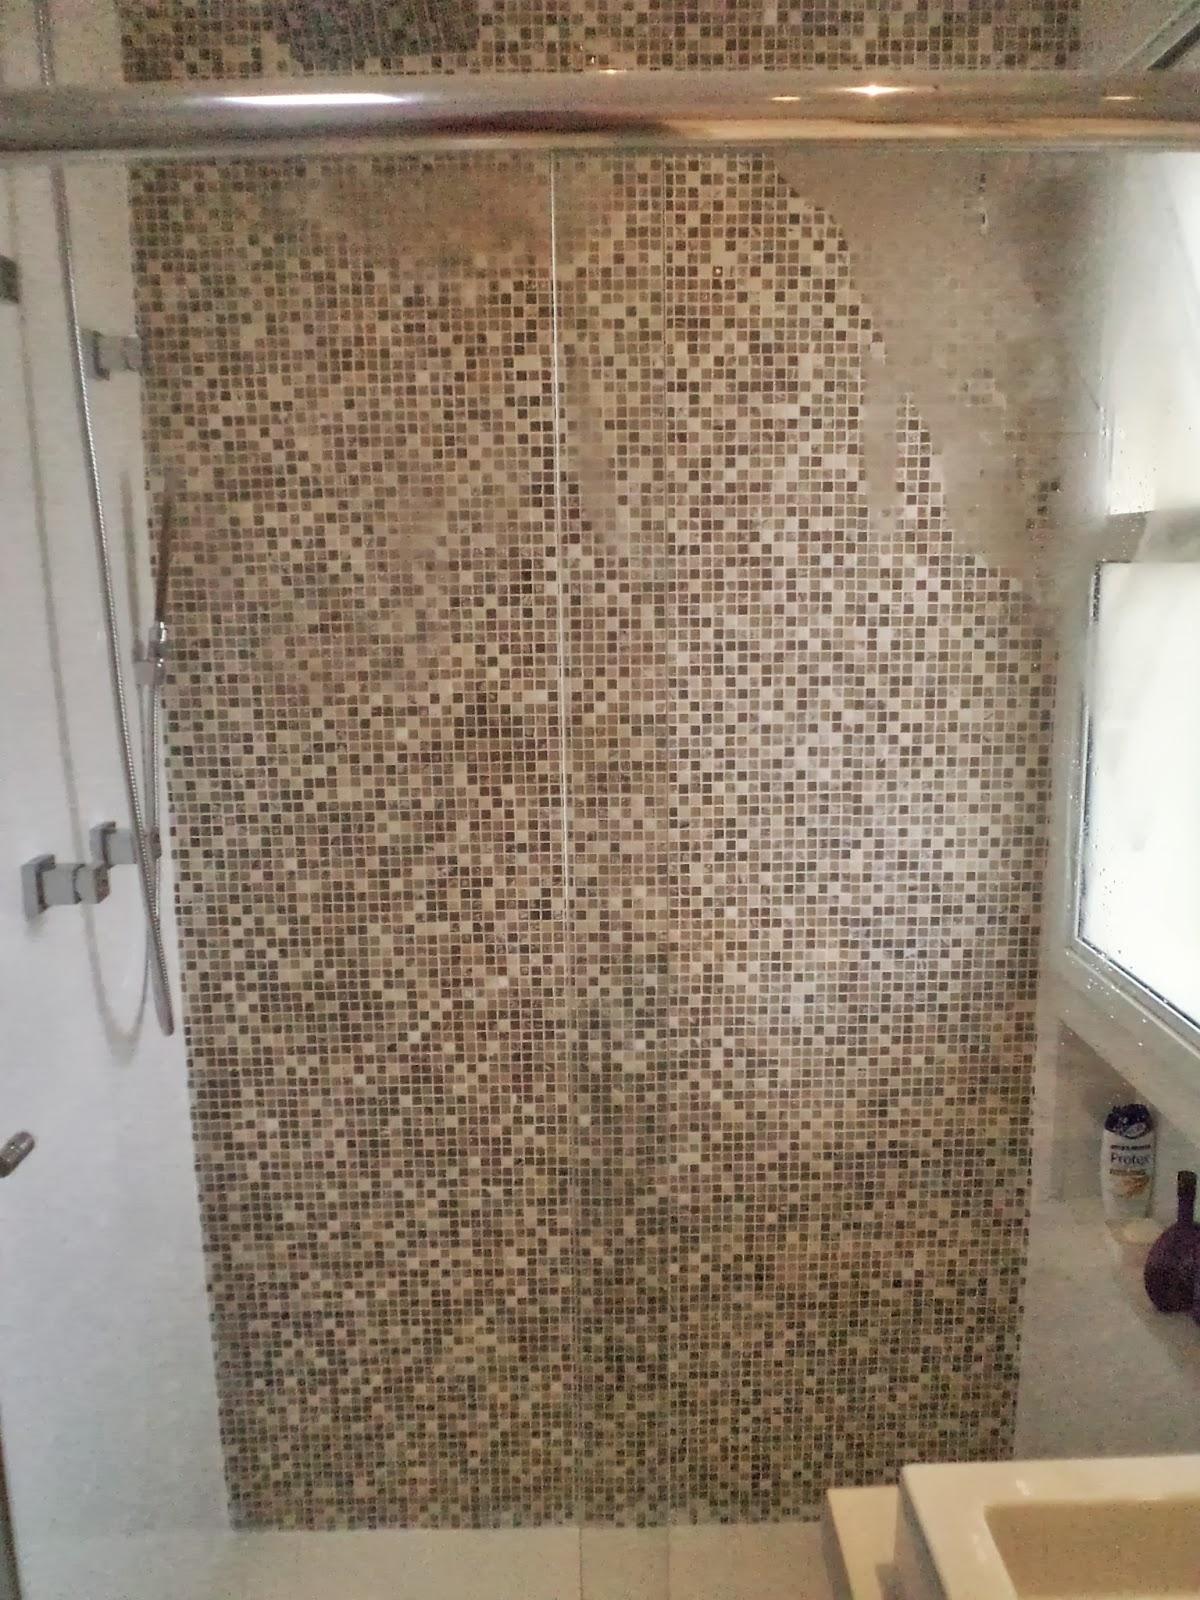 Vânia Paulino : Banheiro Casal #604E39 1200 1600